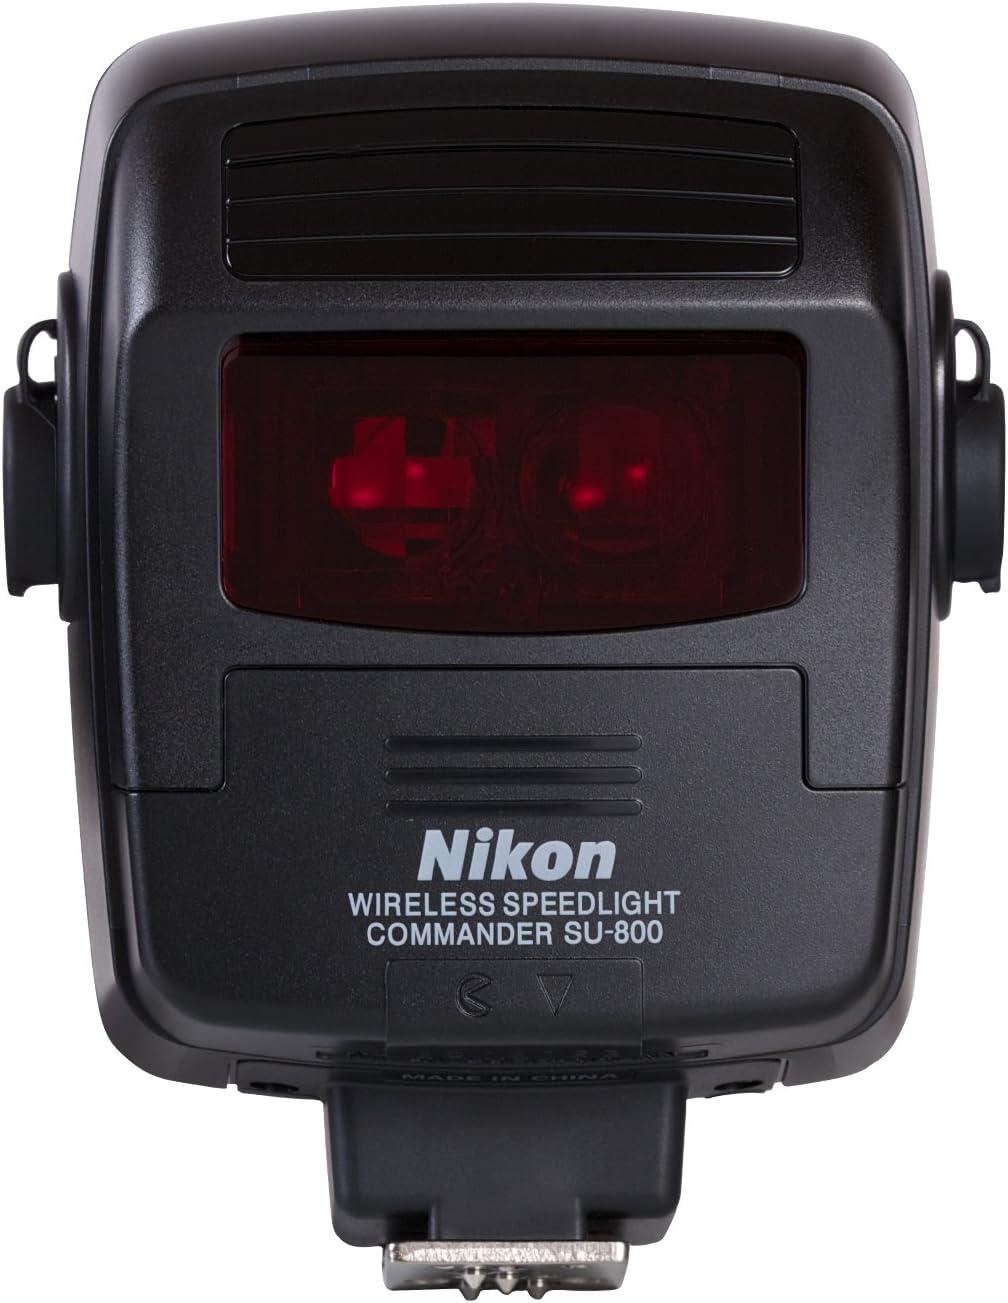 Kit de Close-Up Speedlight Nikon caso SS-MS1